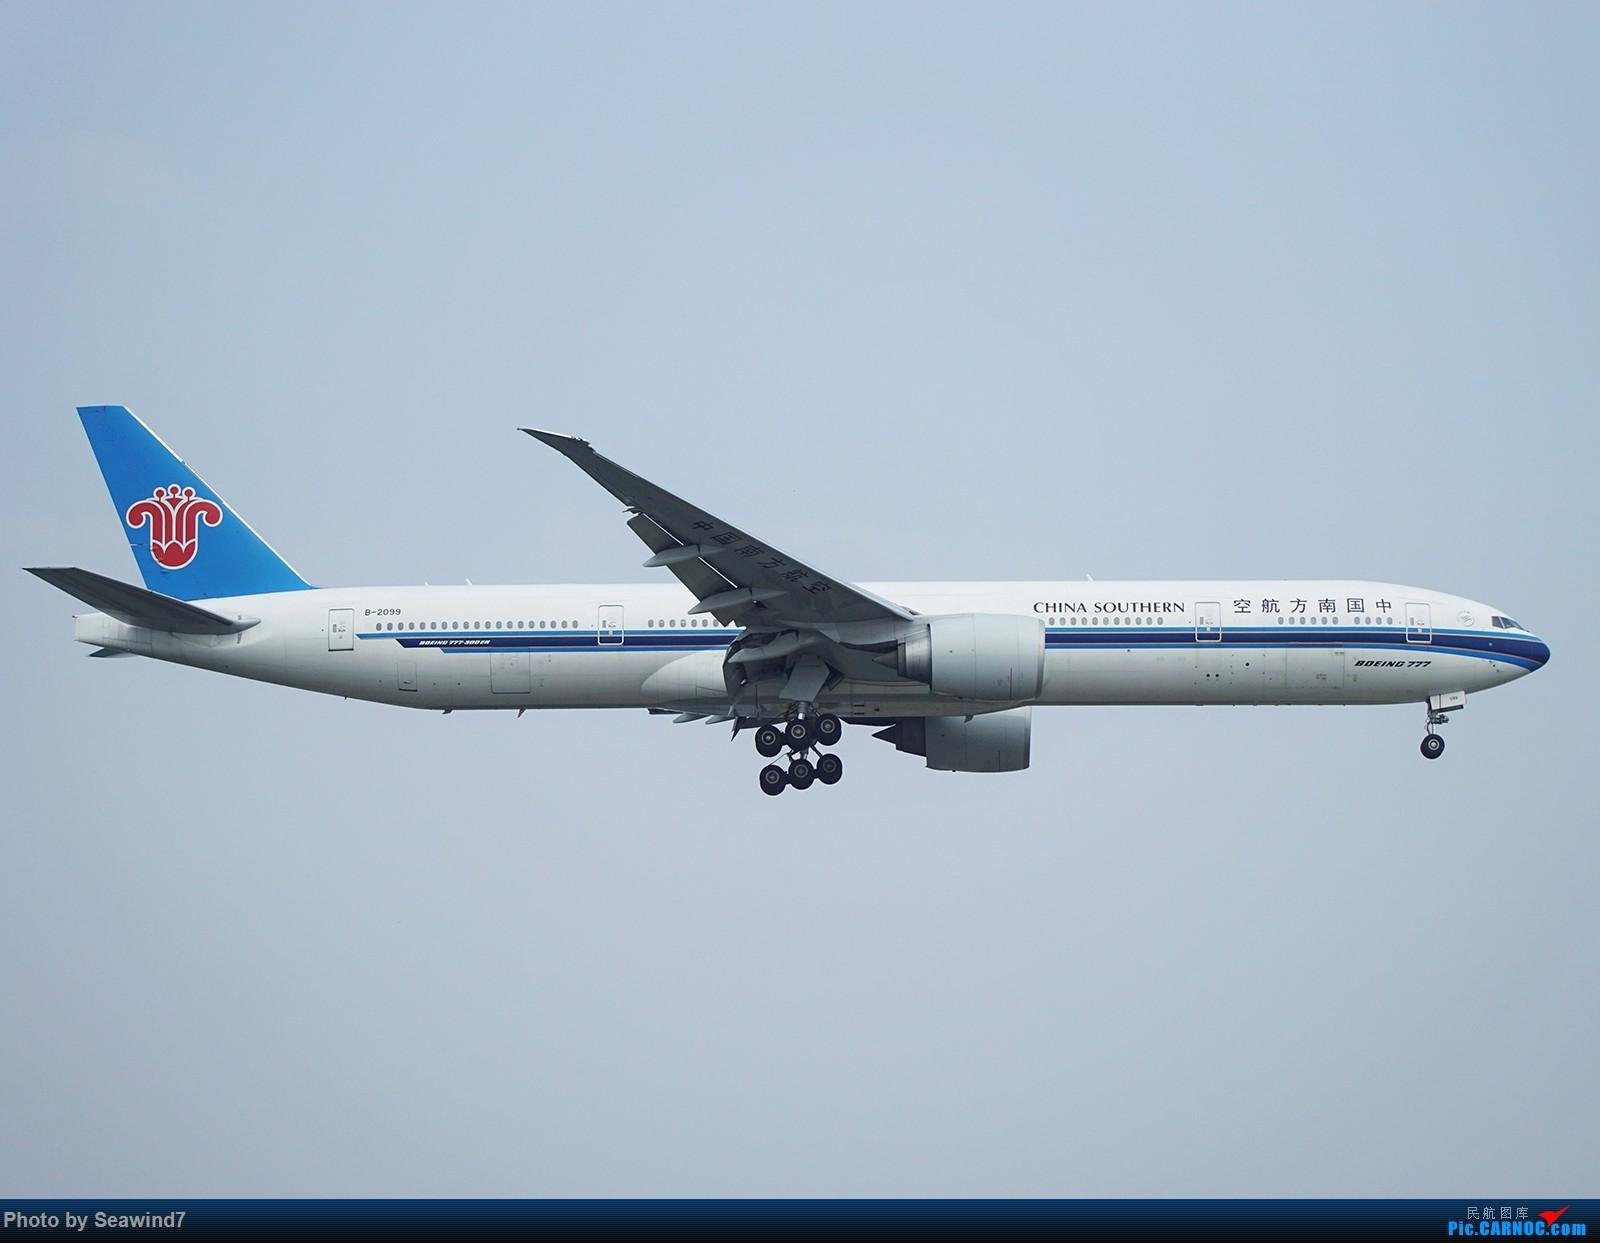 Re:[原创]新手的五一假期(含玩具总动员) BOEING 777-300ER B-2099 中国上海虹桥国际机场